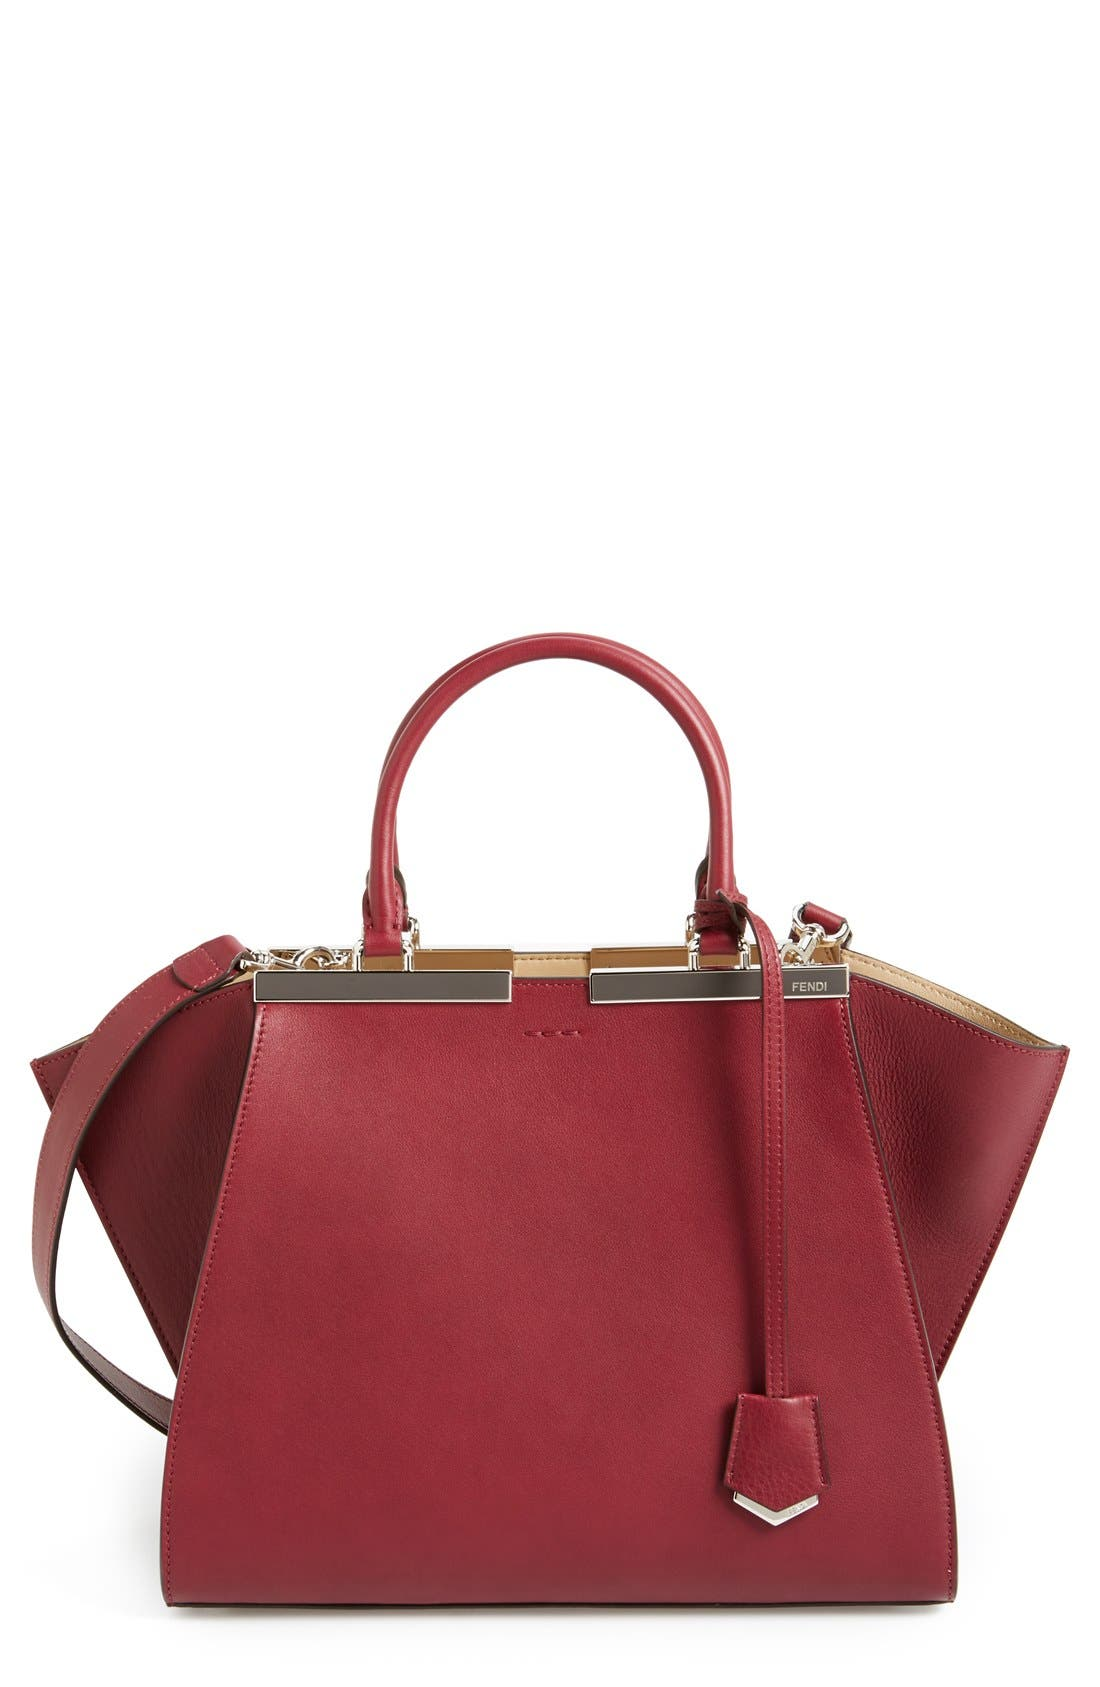 Alternate Image 1 Selected - Fendi 'Petit 3Jours' Leather Shopper